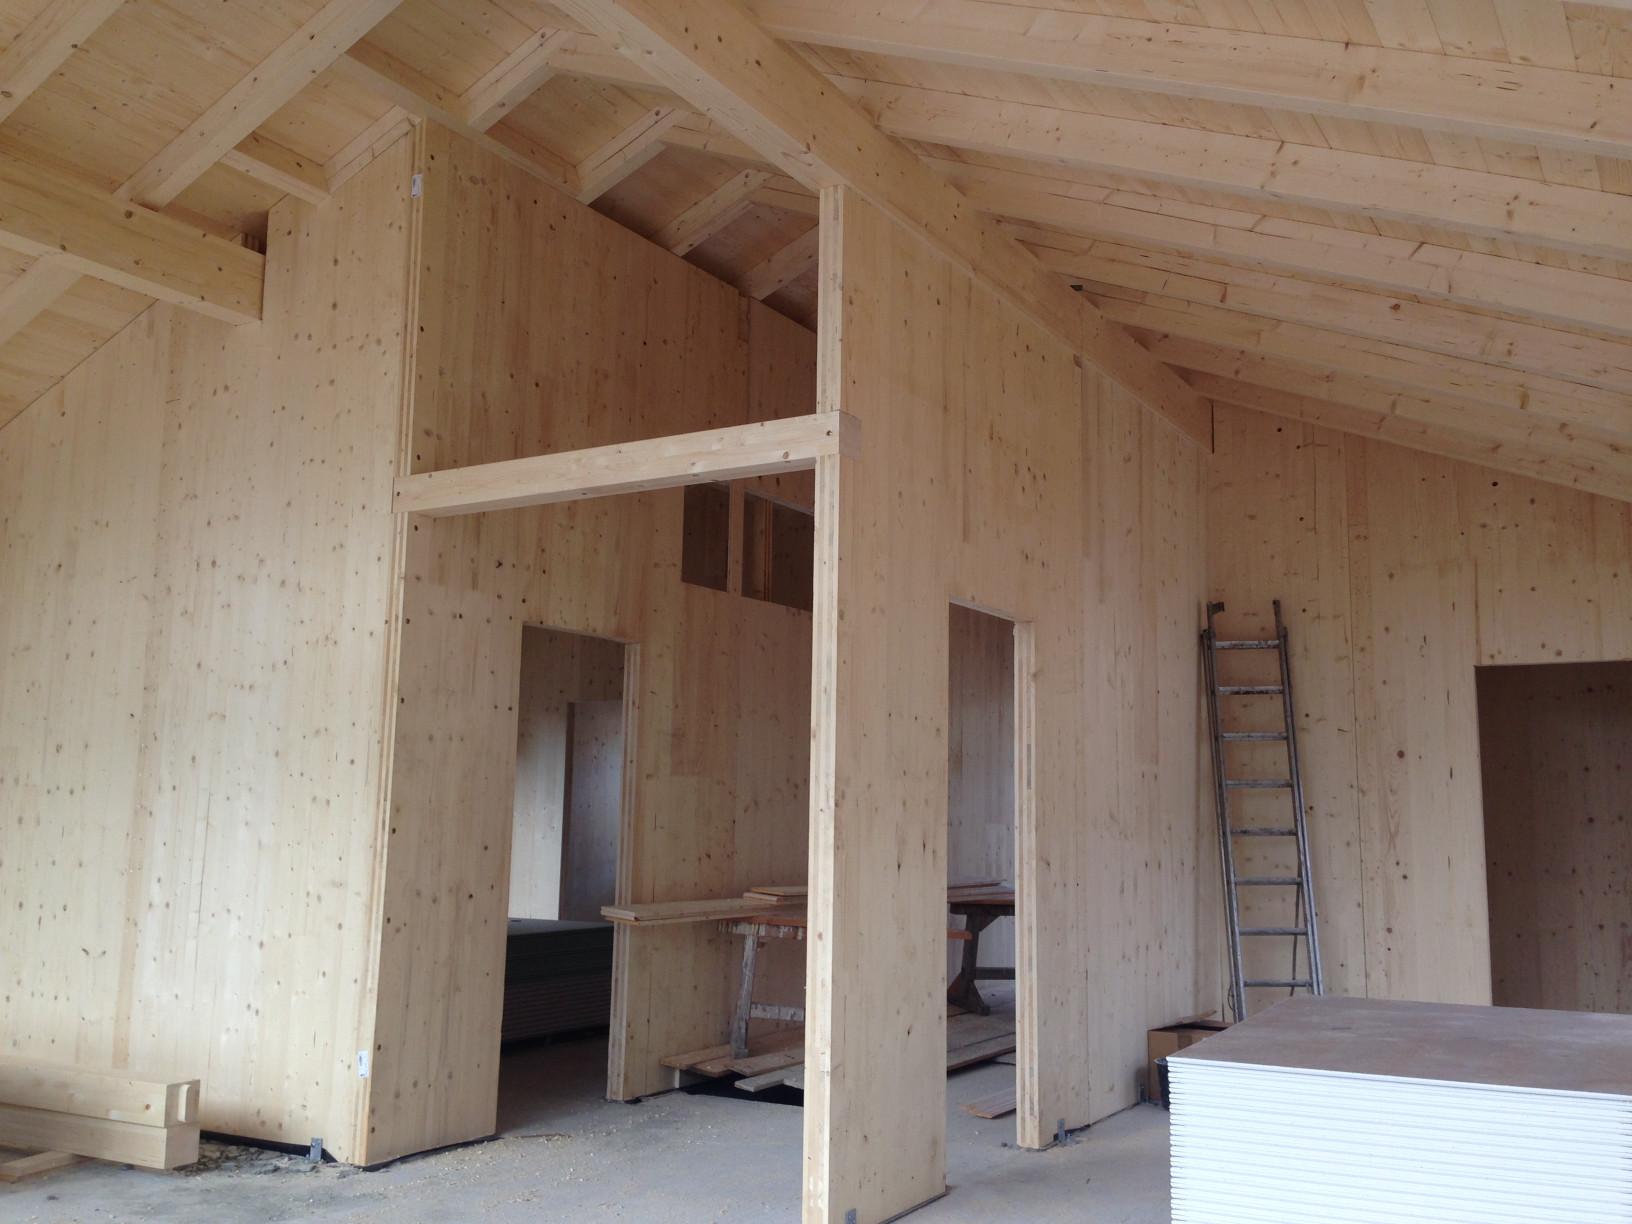 IMG_2849Strasser Holzbau Riedering.jpg